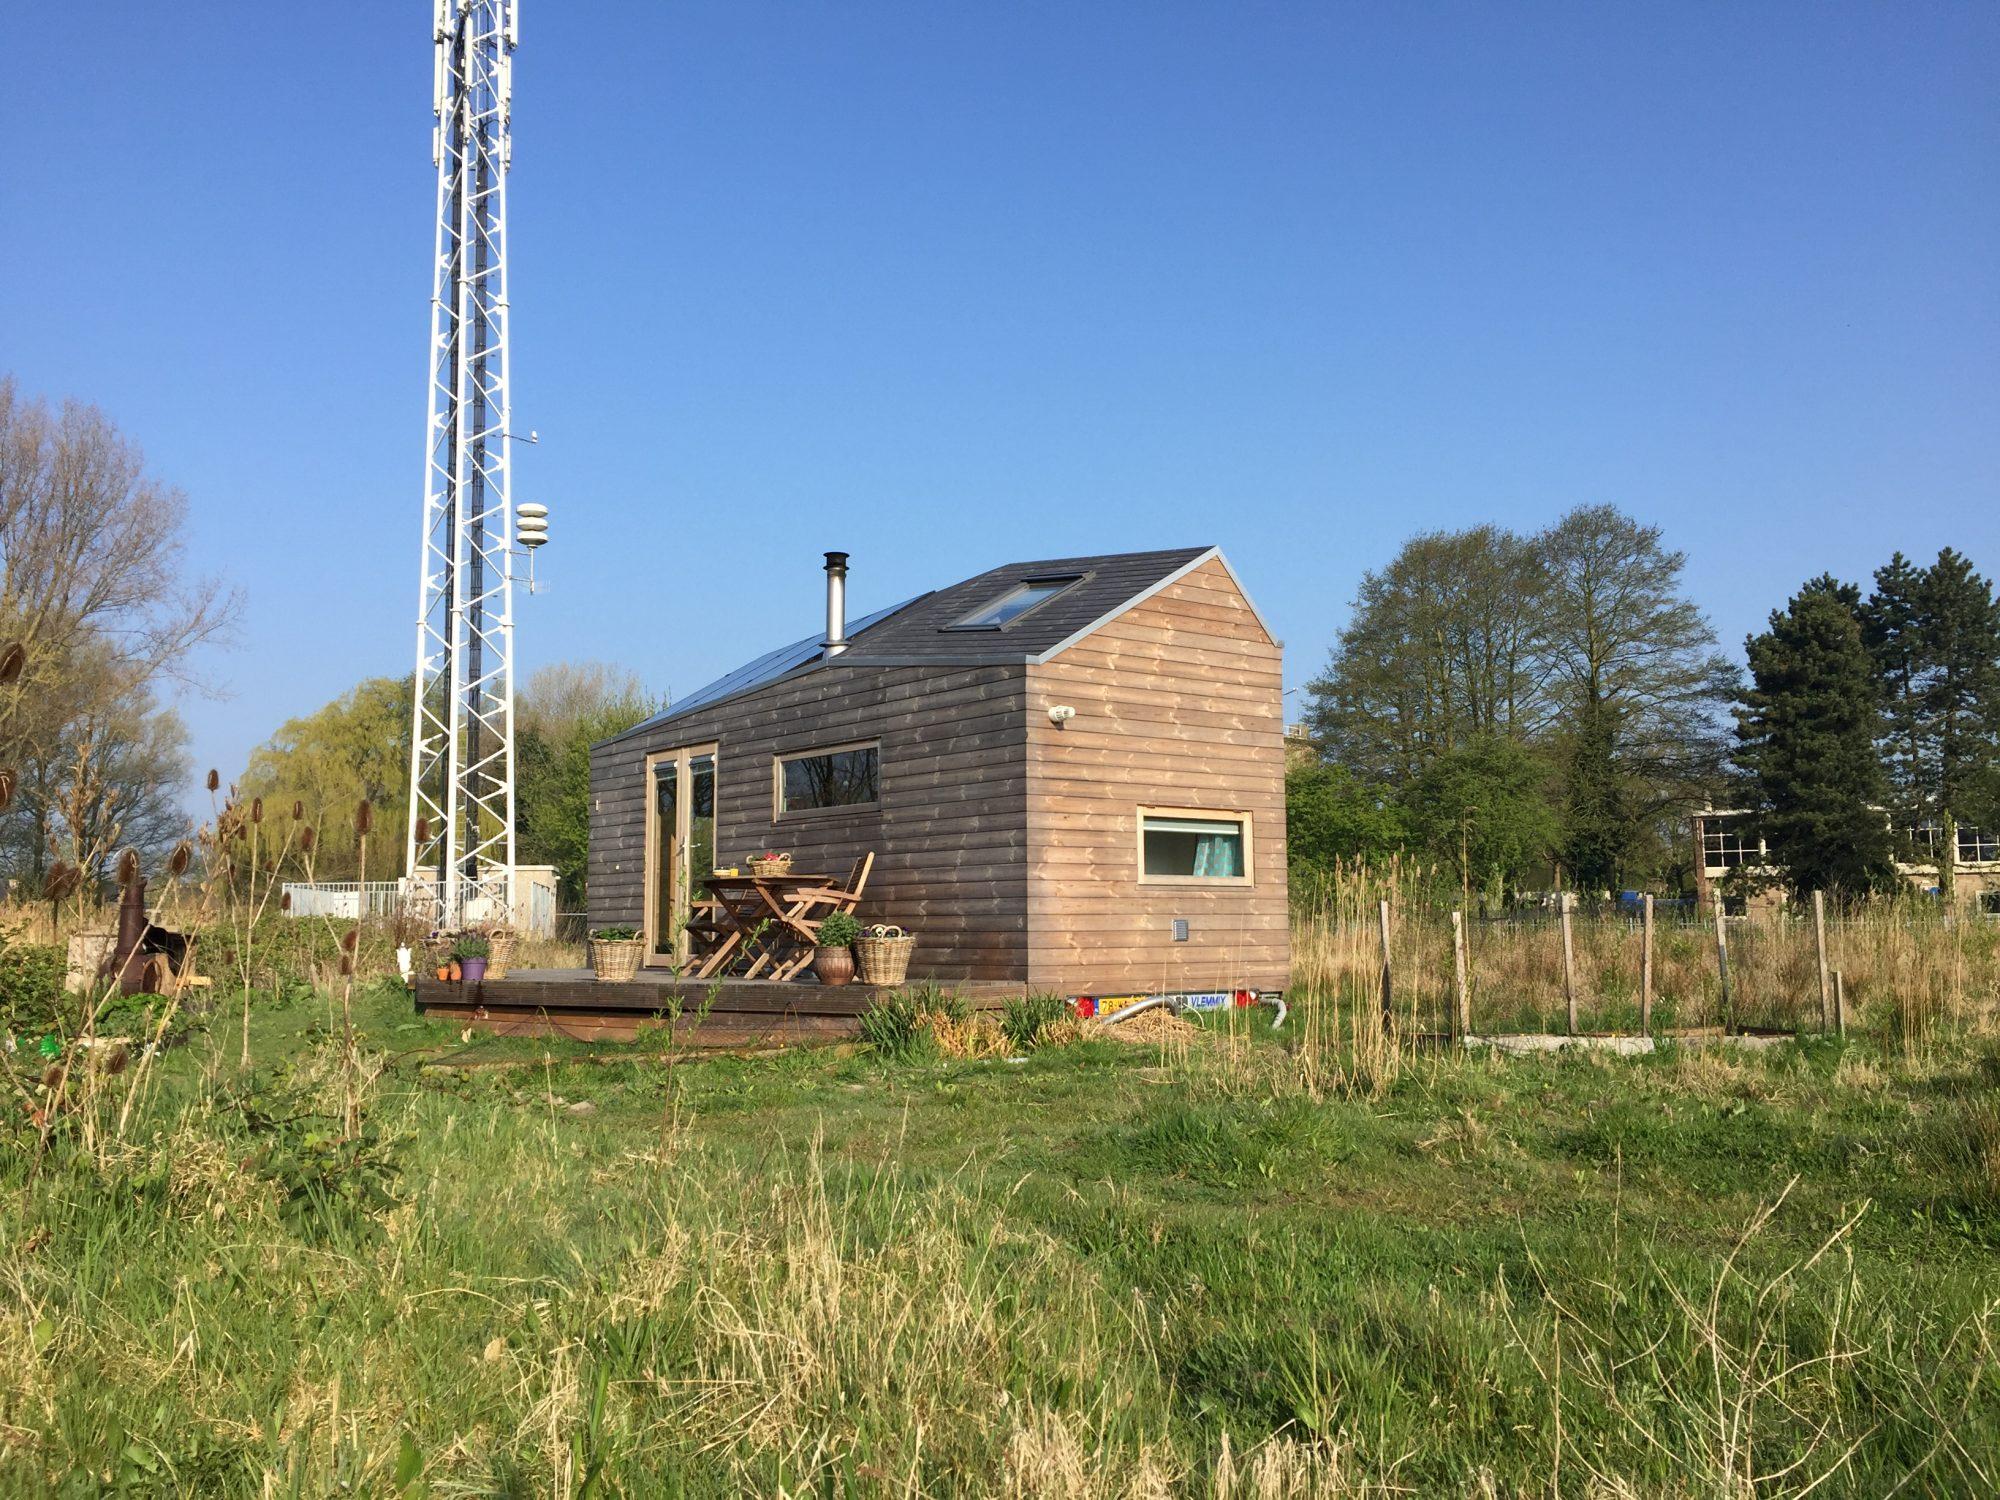 Mijn Klein Huisje : Huisje in het bos jolanda toet